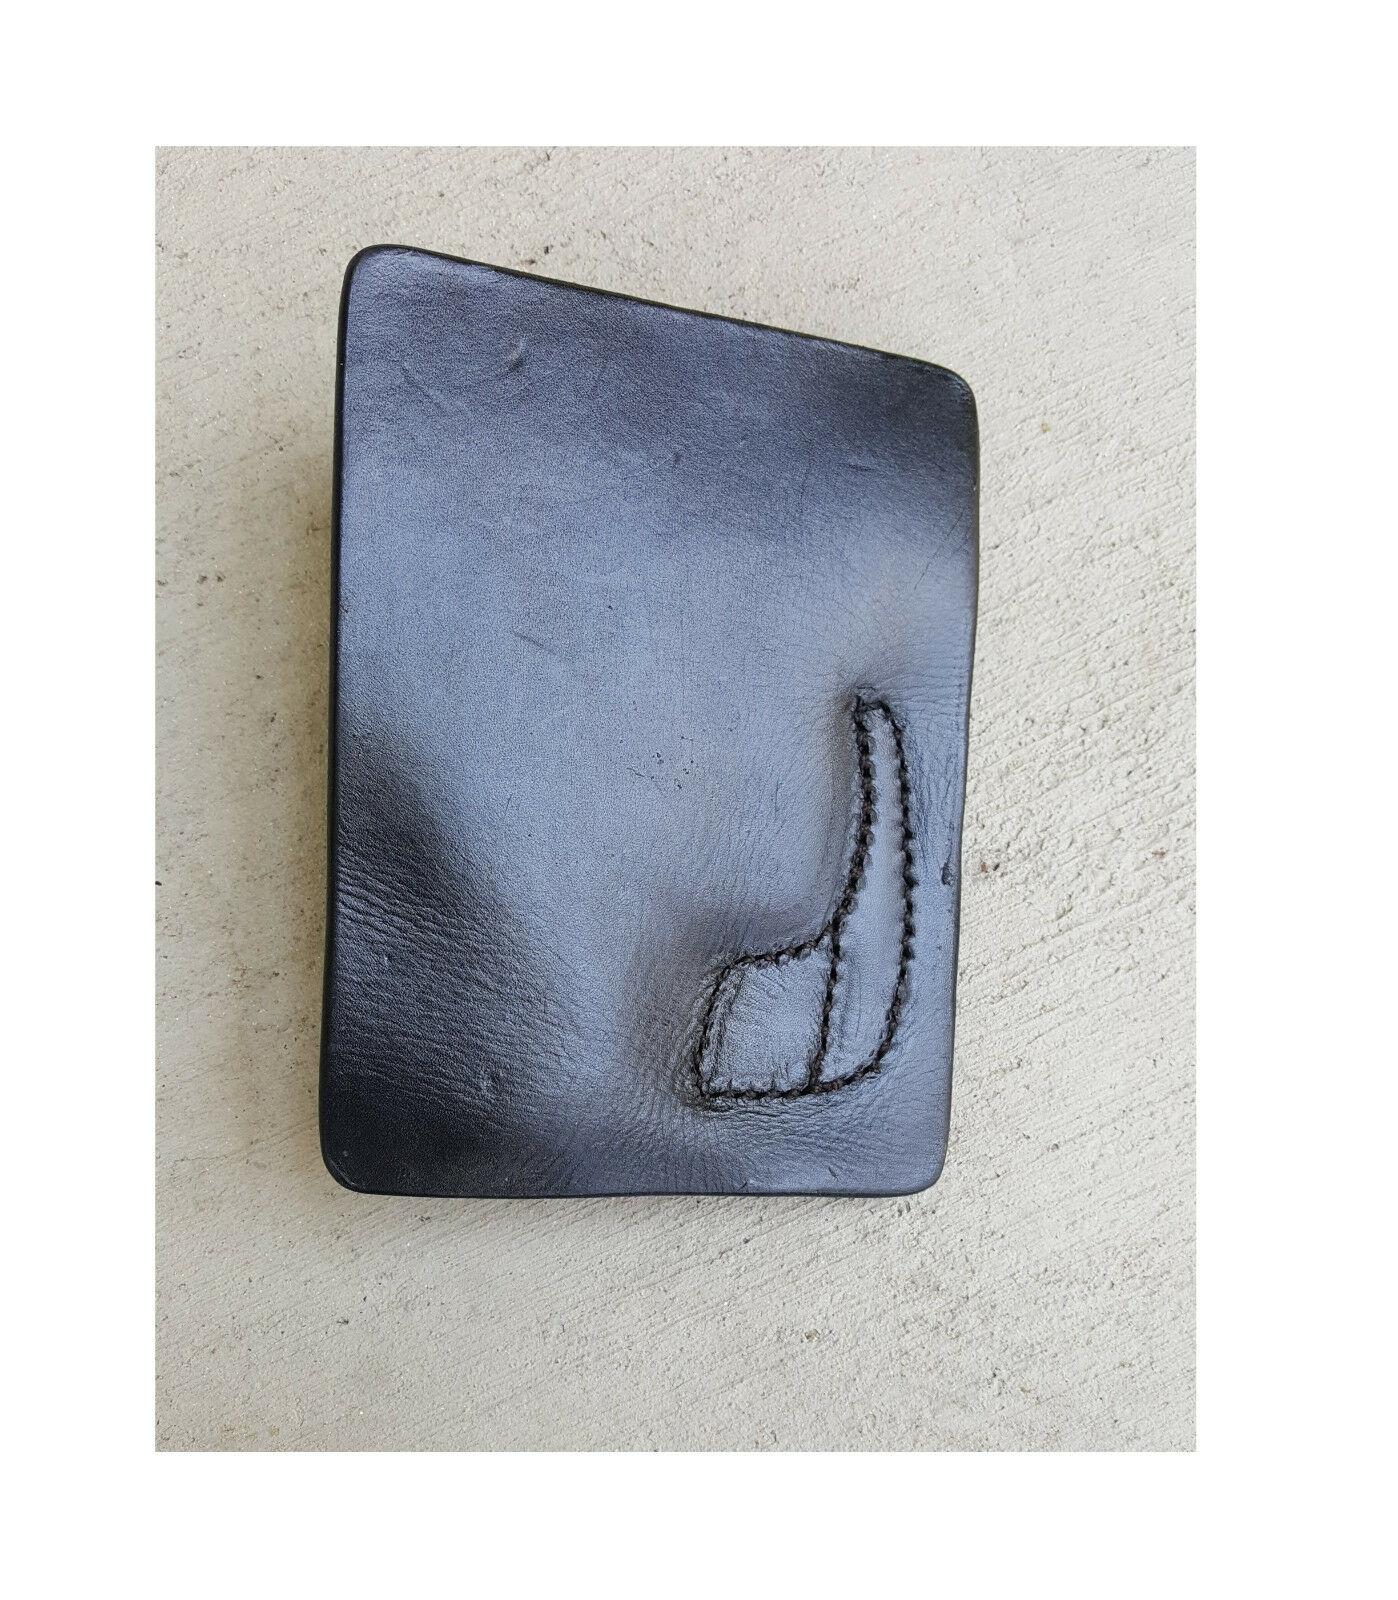 Tagua Leather For Keltec 380 & Ruger LCP - Back Pocket Holster PK5-010 - RH